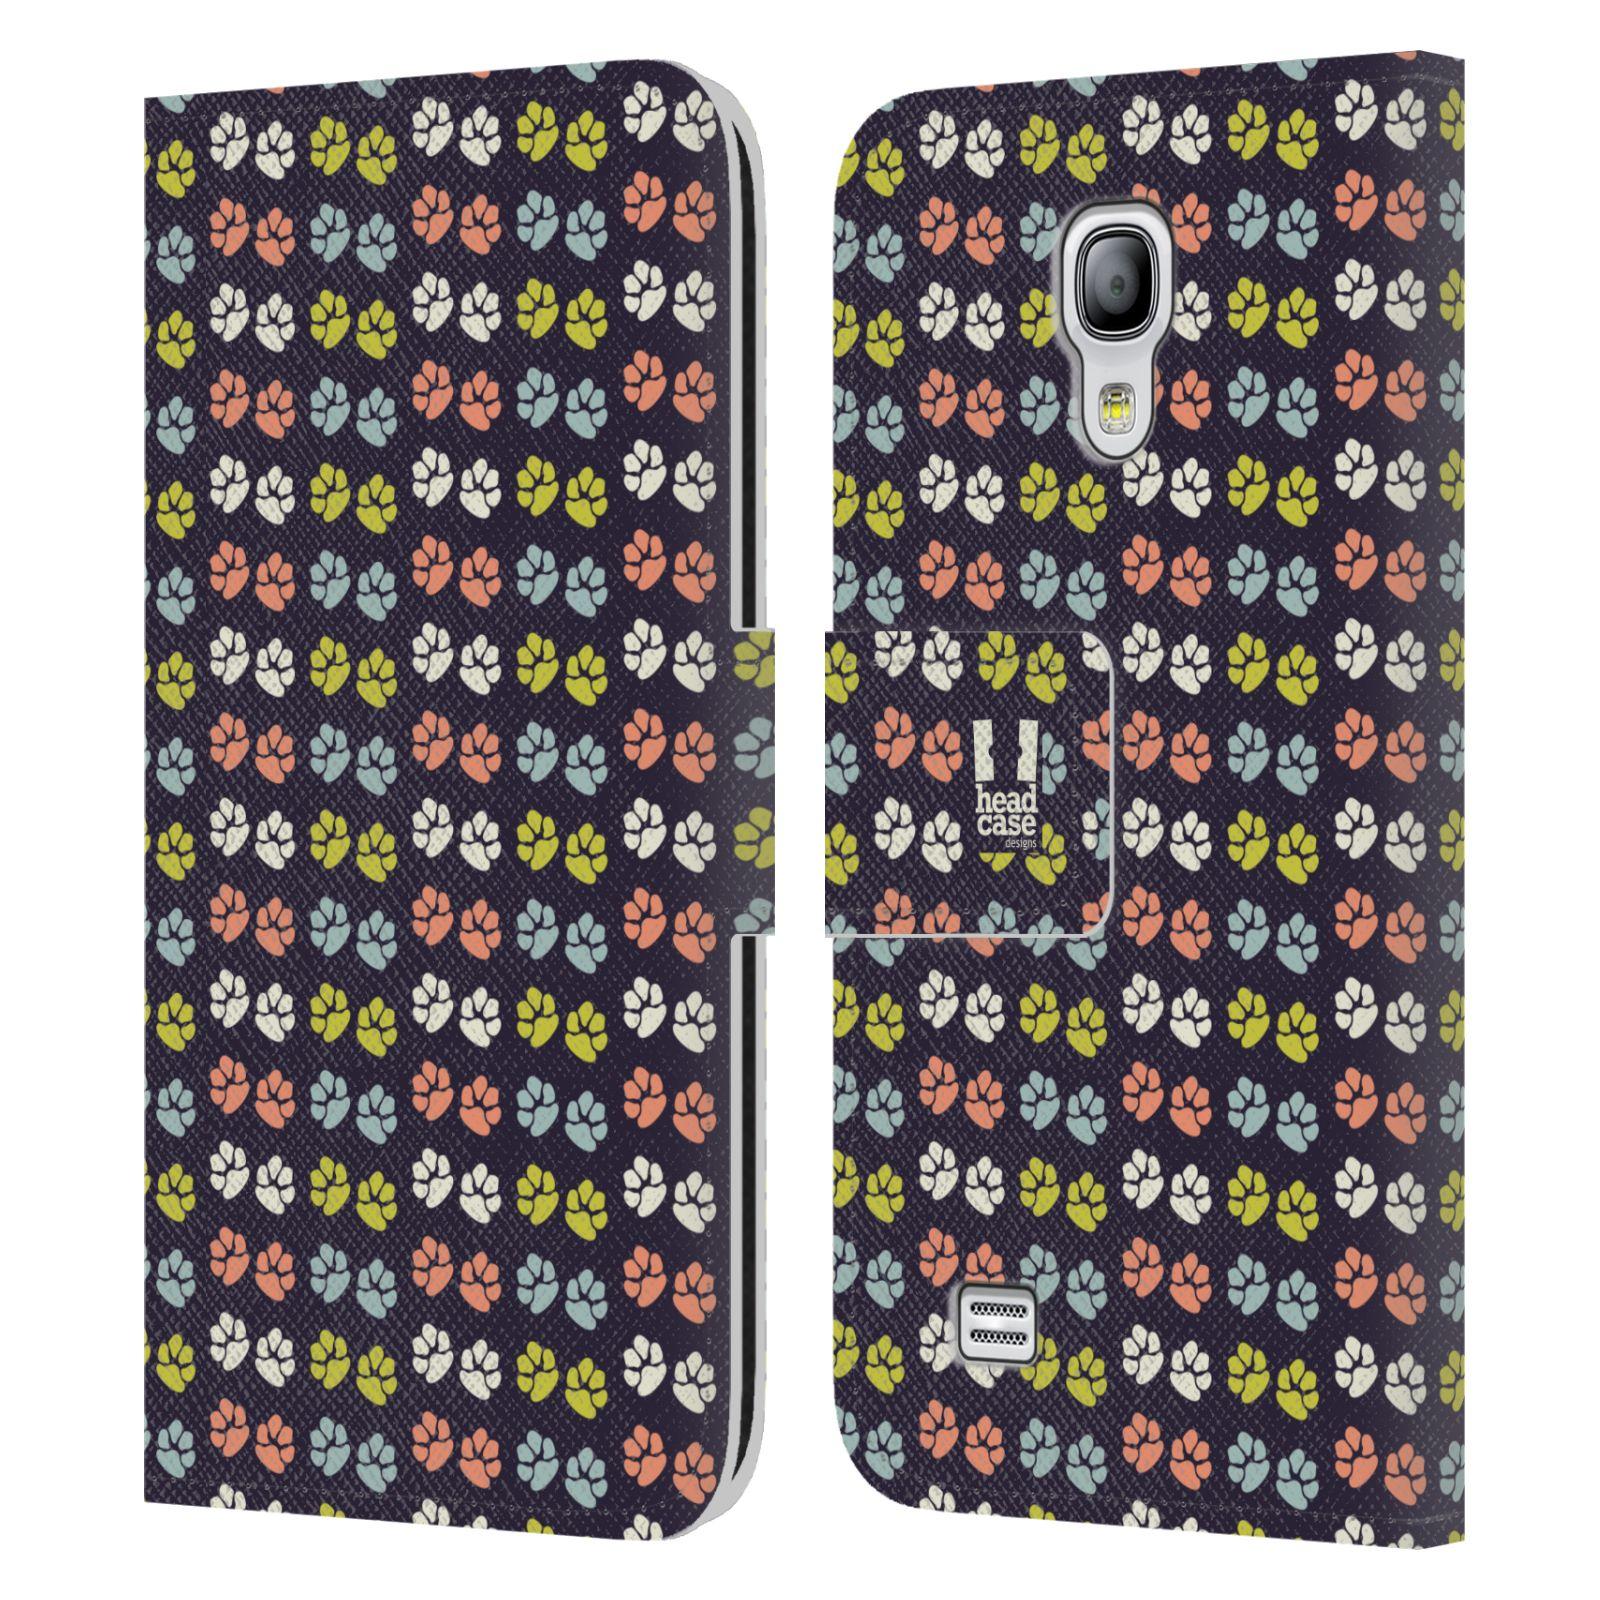 HEAD CASE Flipové pouzdro pro mobil Samsung Galaxy S4 MINI / S4 MINI DUOS Pejsek ťapky barevné RETRO